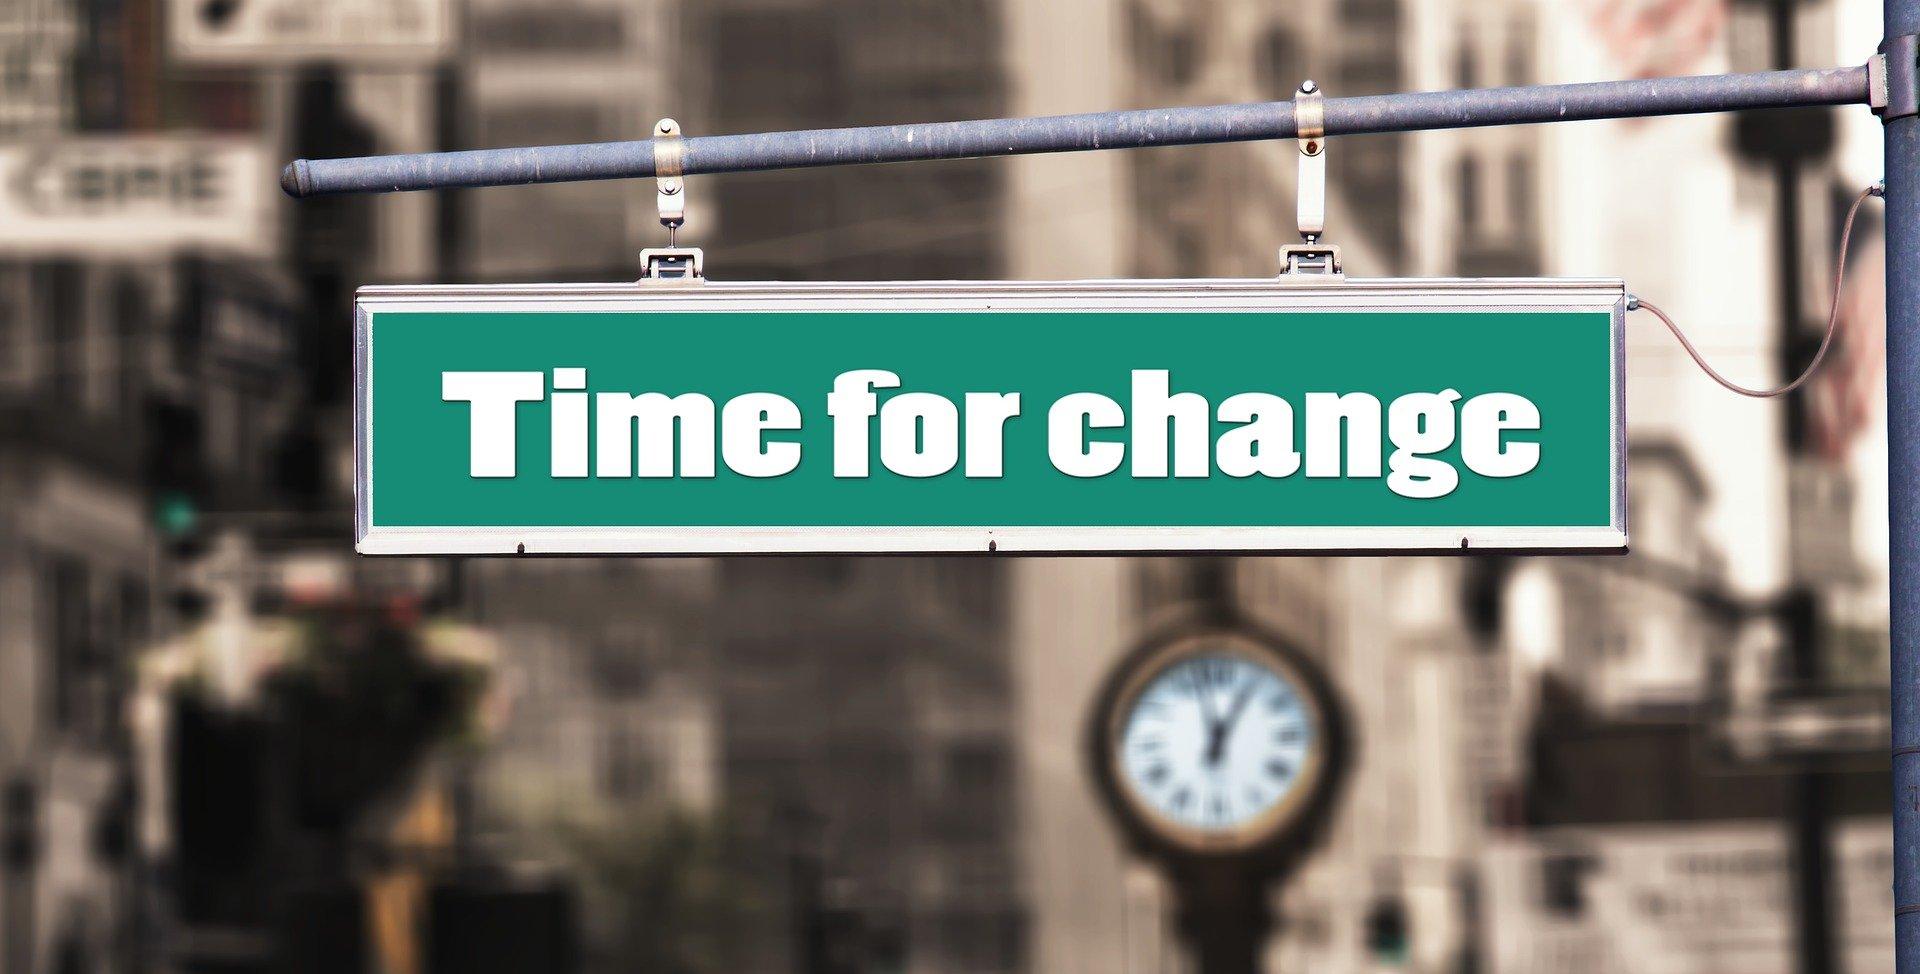 Straßenschild time for change